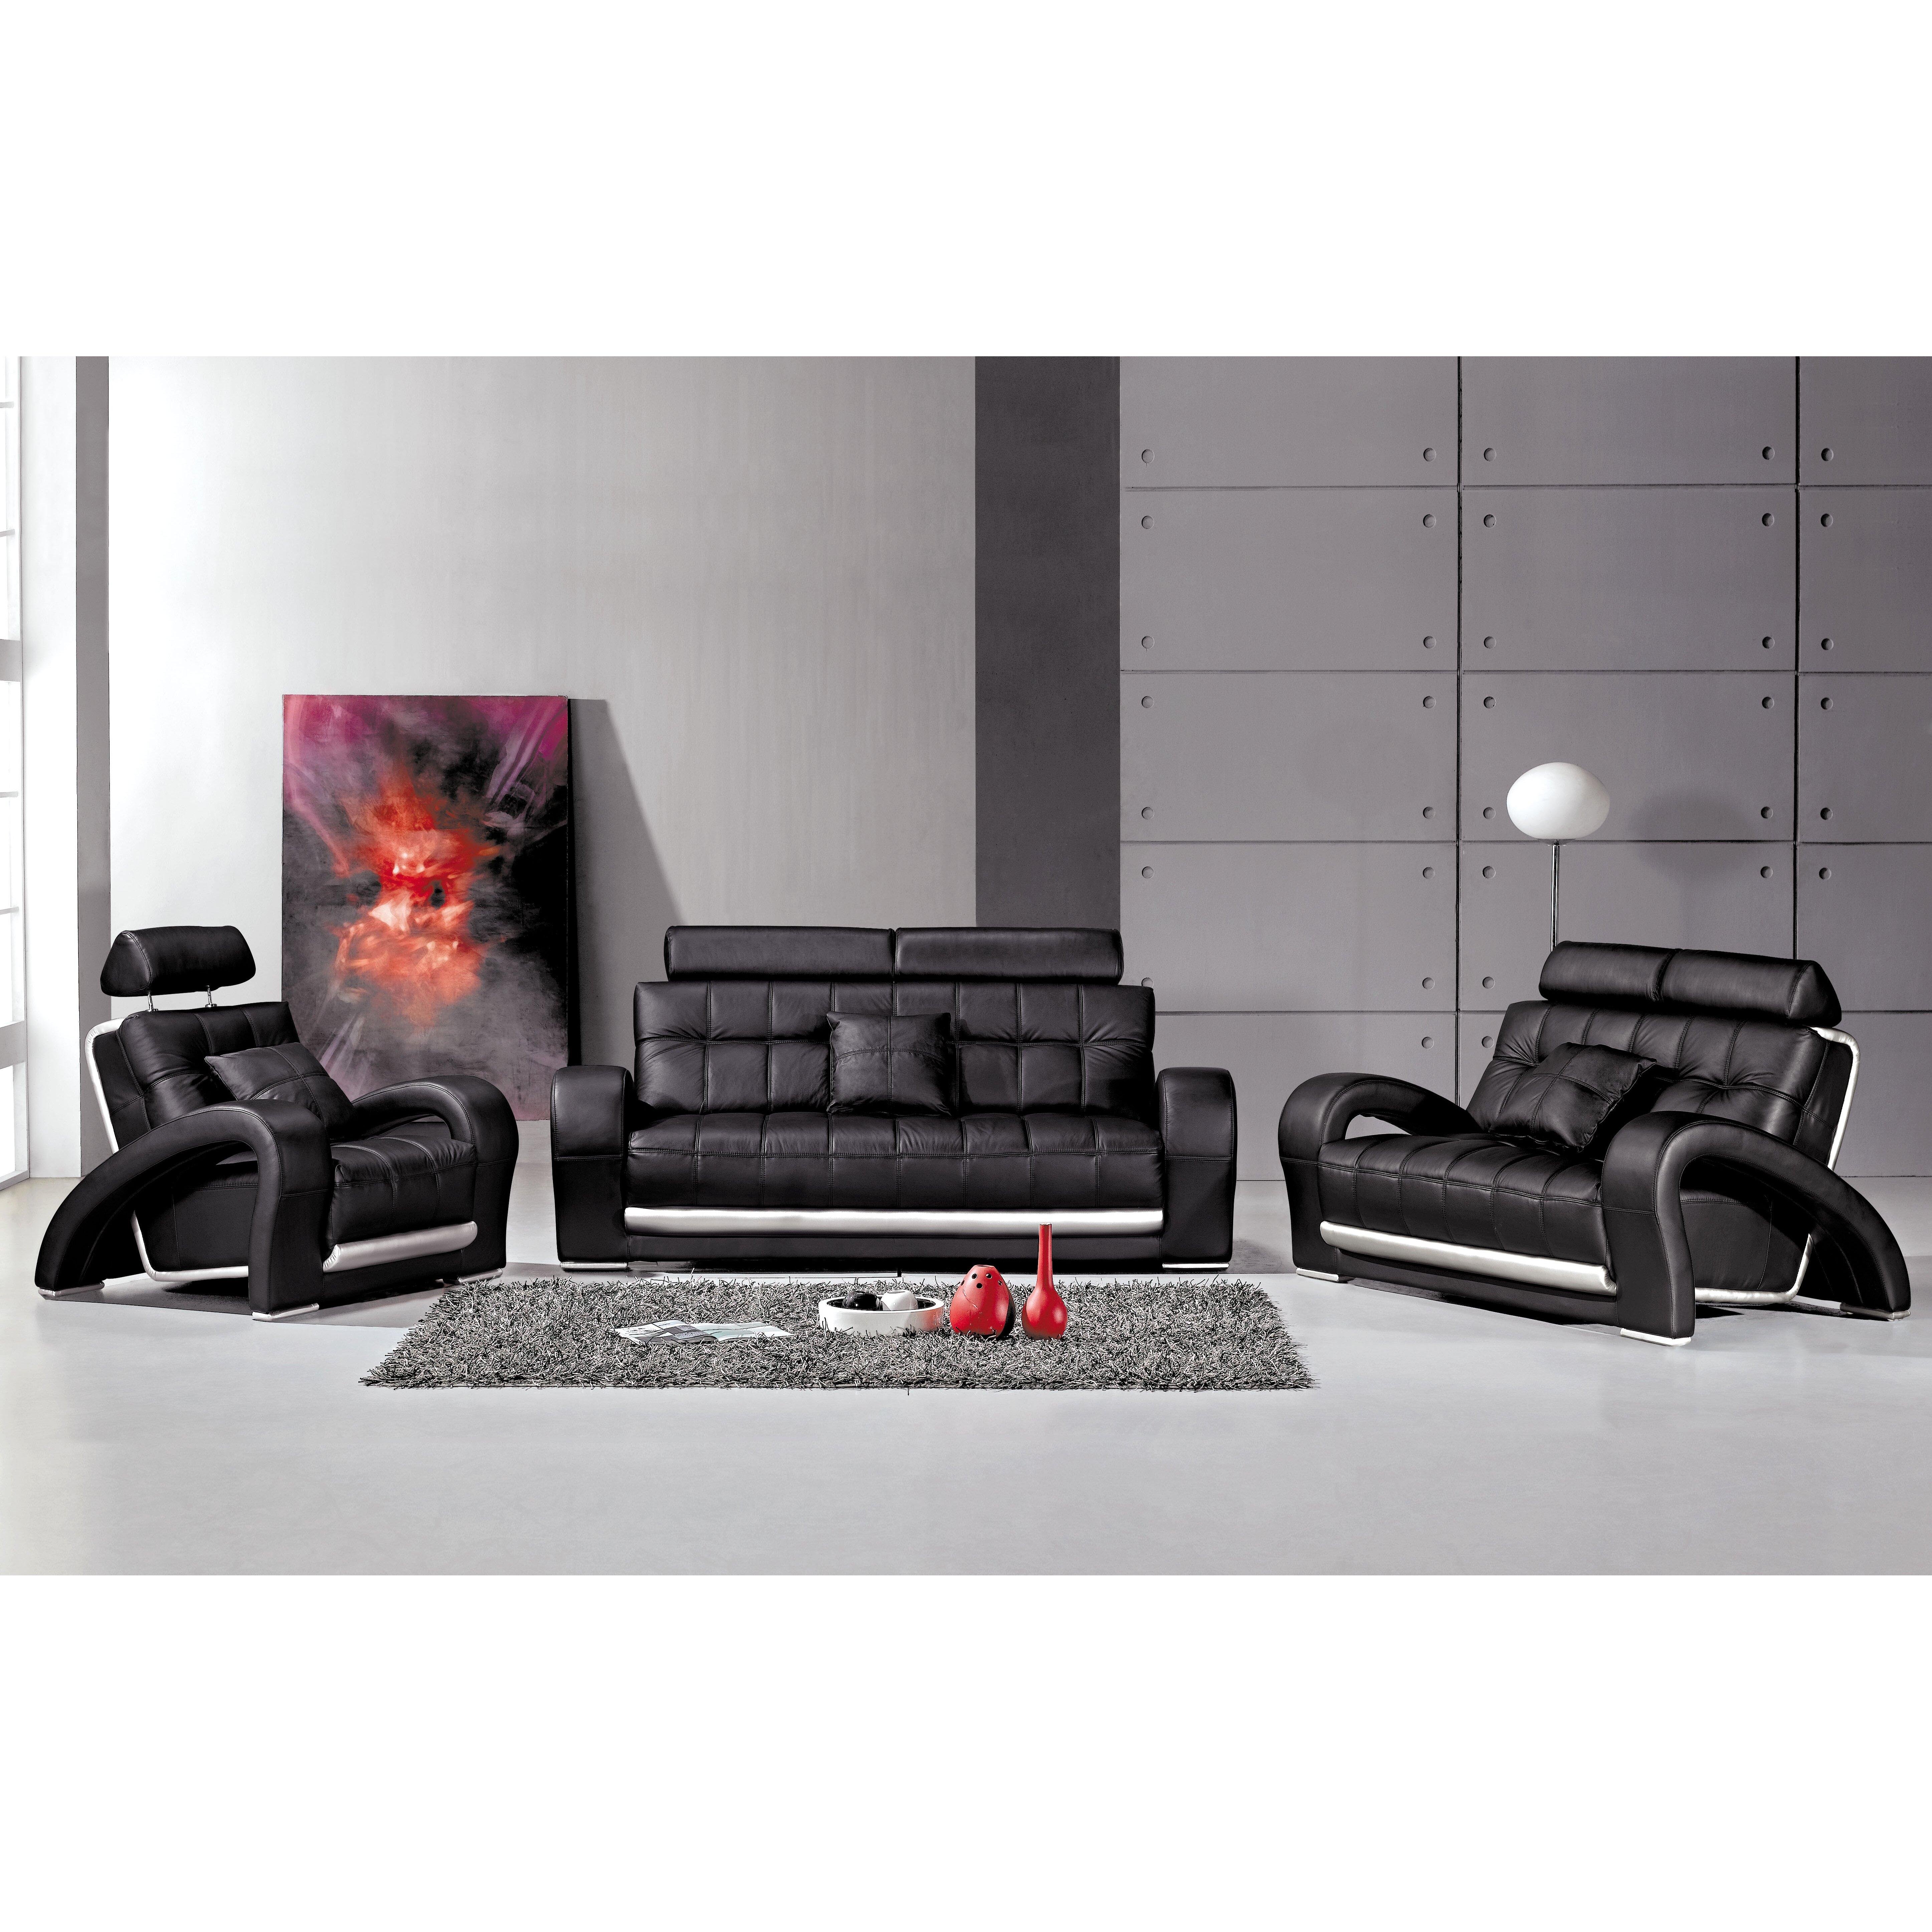 3 Piece Leather Sofa: Hokku Designs Arthur 3 Piece Leather Sofa Set & Reviews